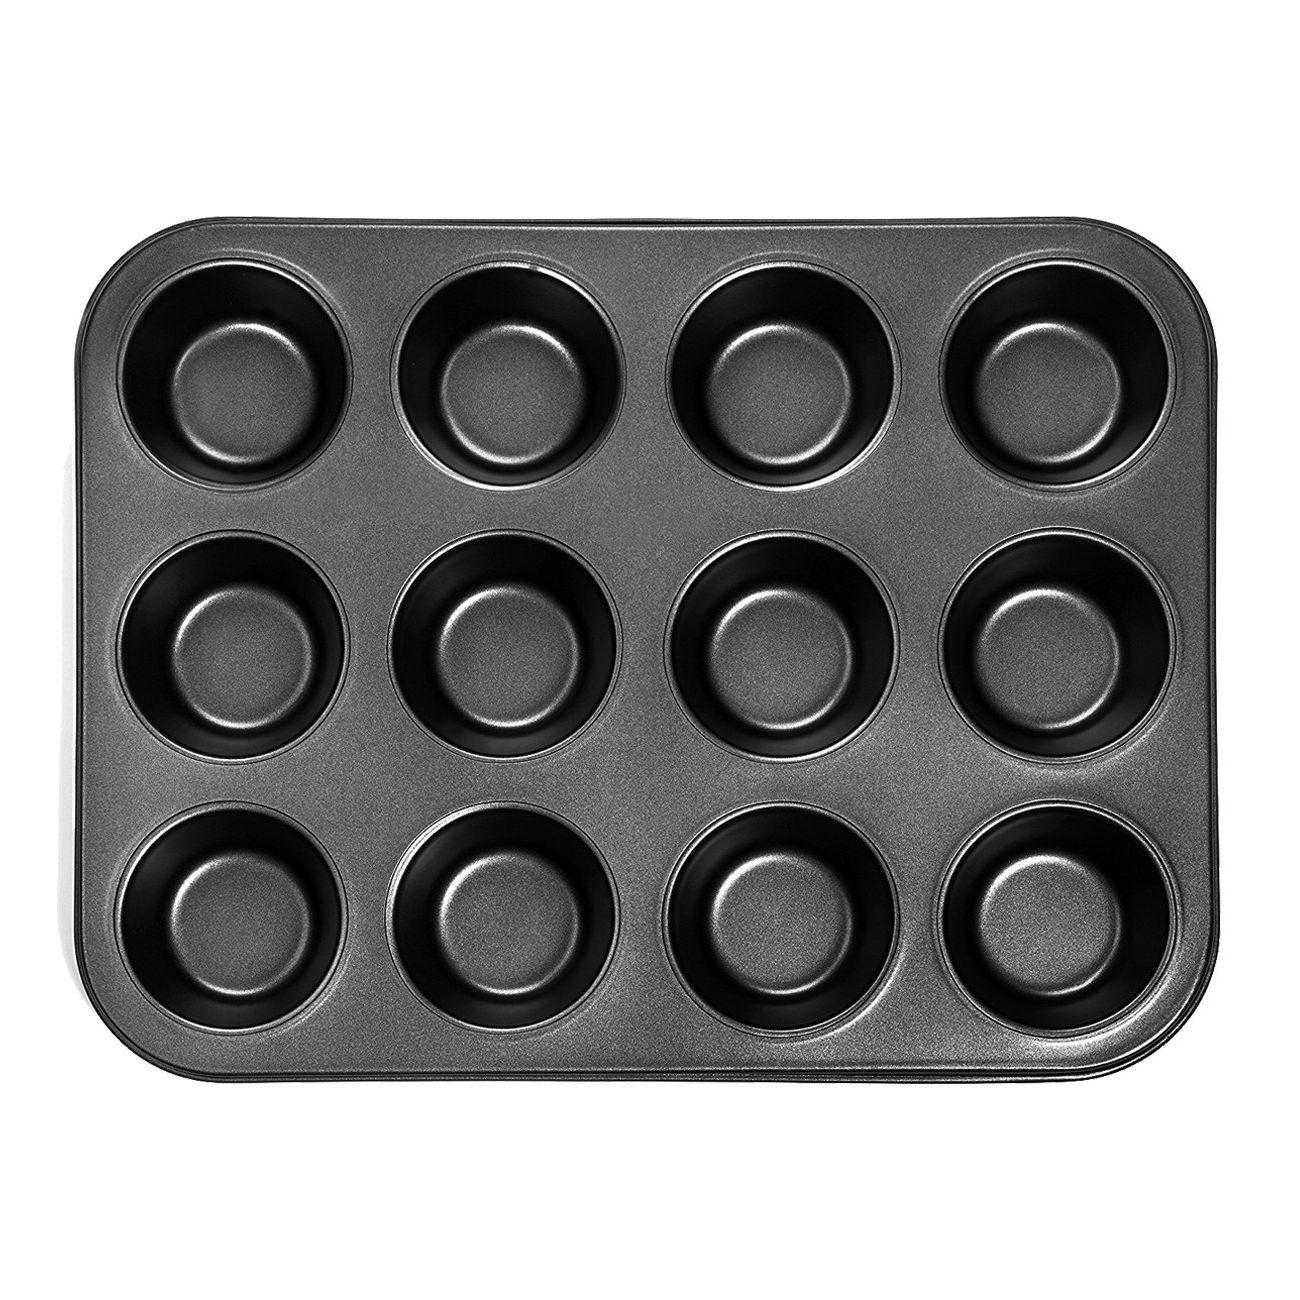 Heavy duty carbon steel cupcake baking tray,12 mini cup cupcake shaped cake pan,nonstick cupcake baking tray, cupcake mold